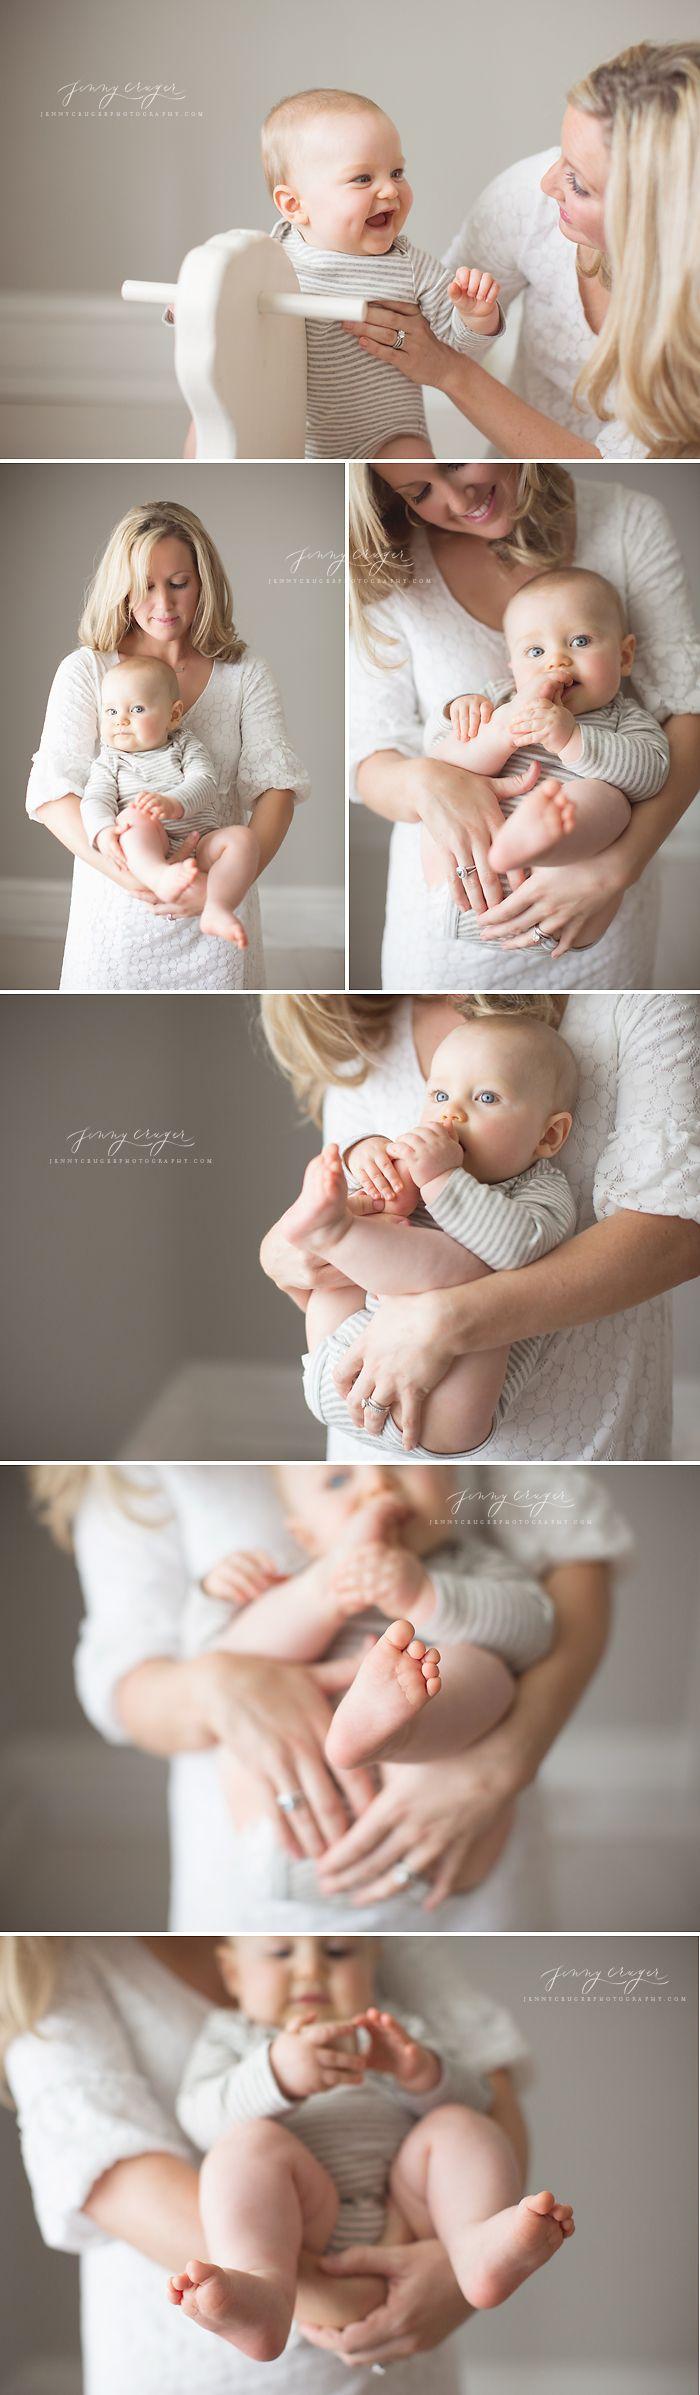 6 months - jenny cruger photography | nashville baby photographer